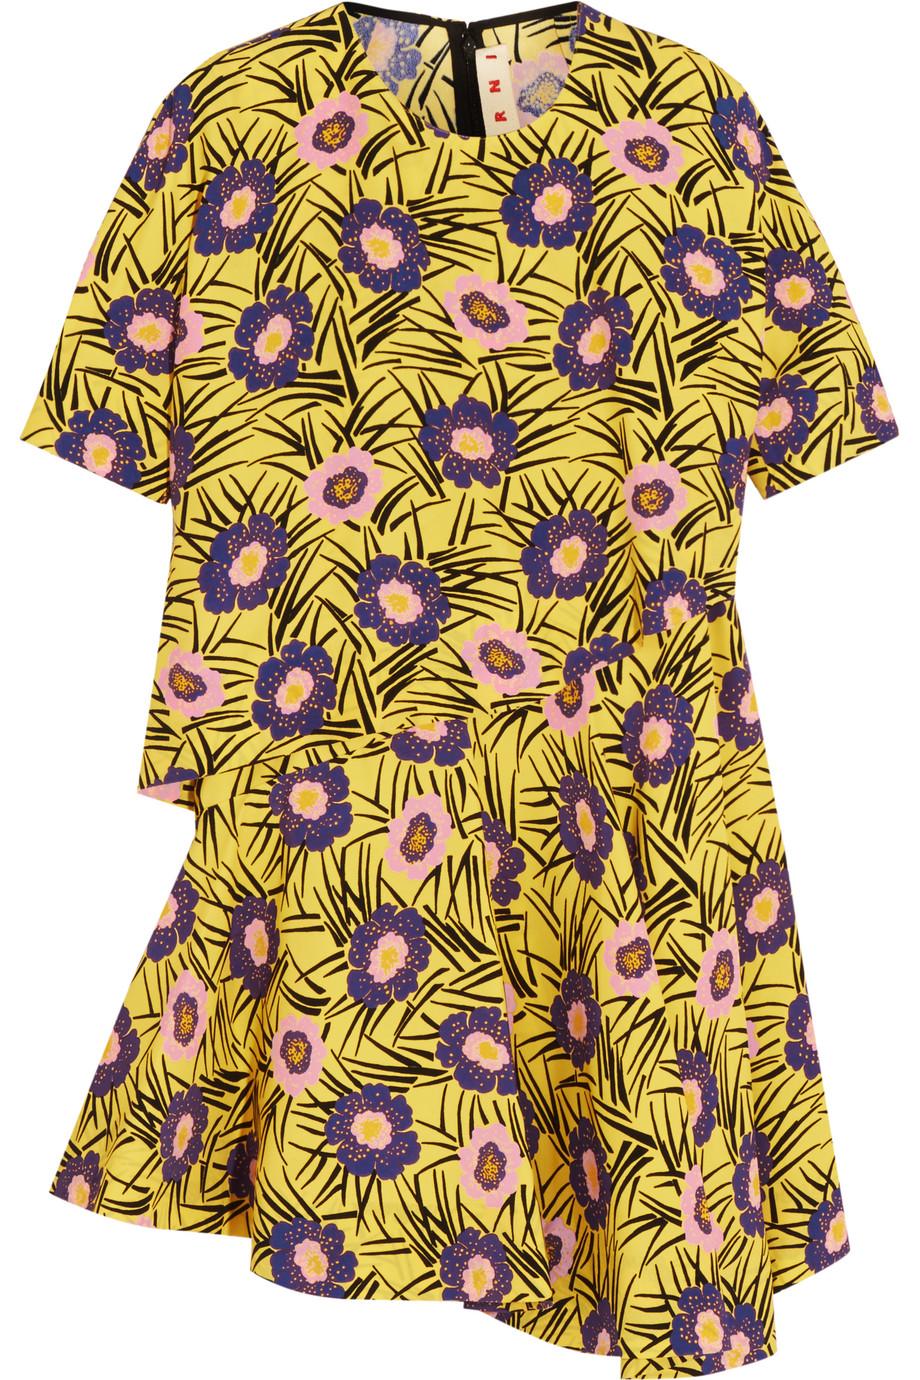 Marni Layered Floral-Print Poplin Top, Yellow, Women's, Size: 42